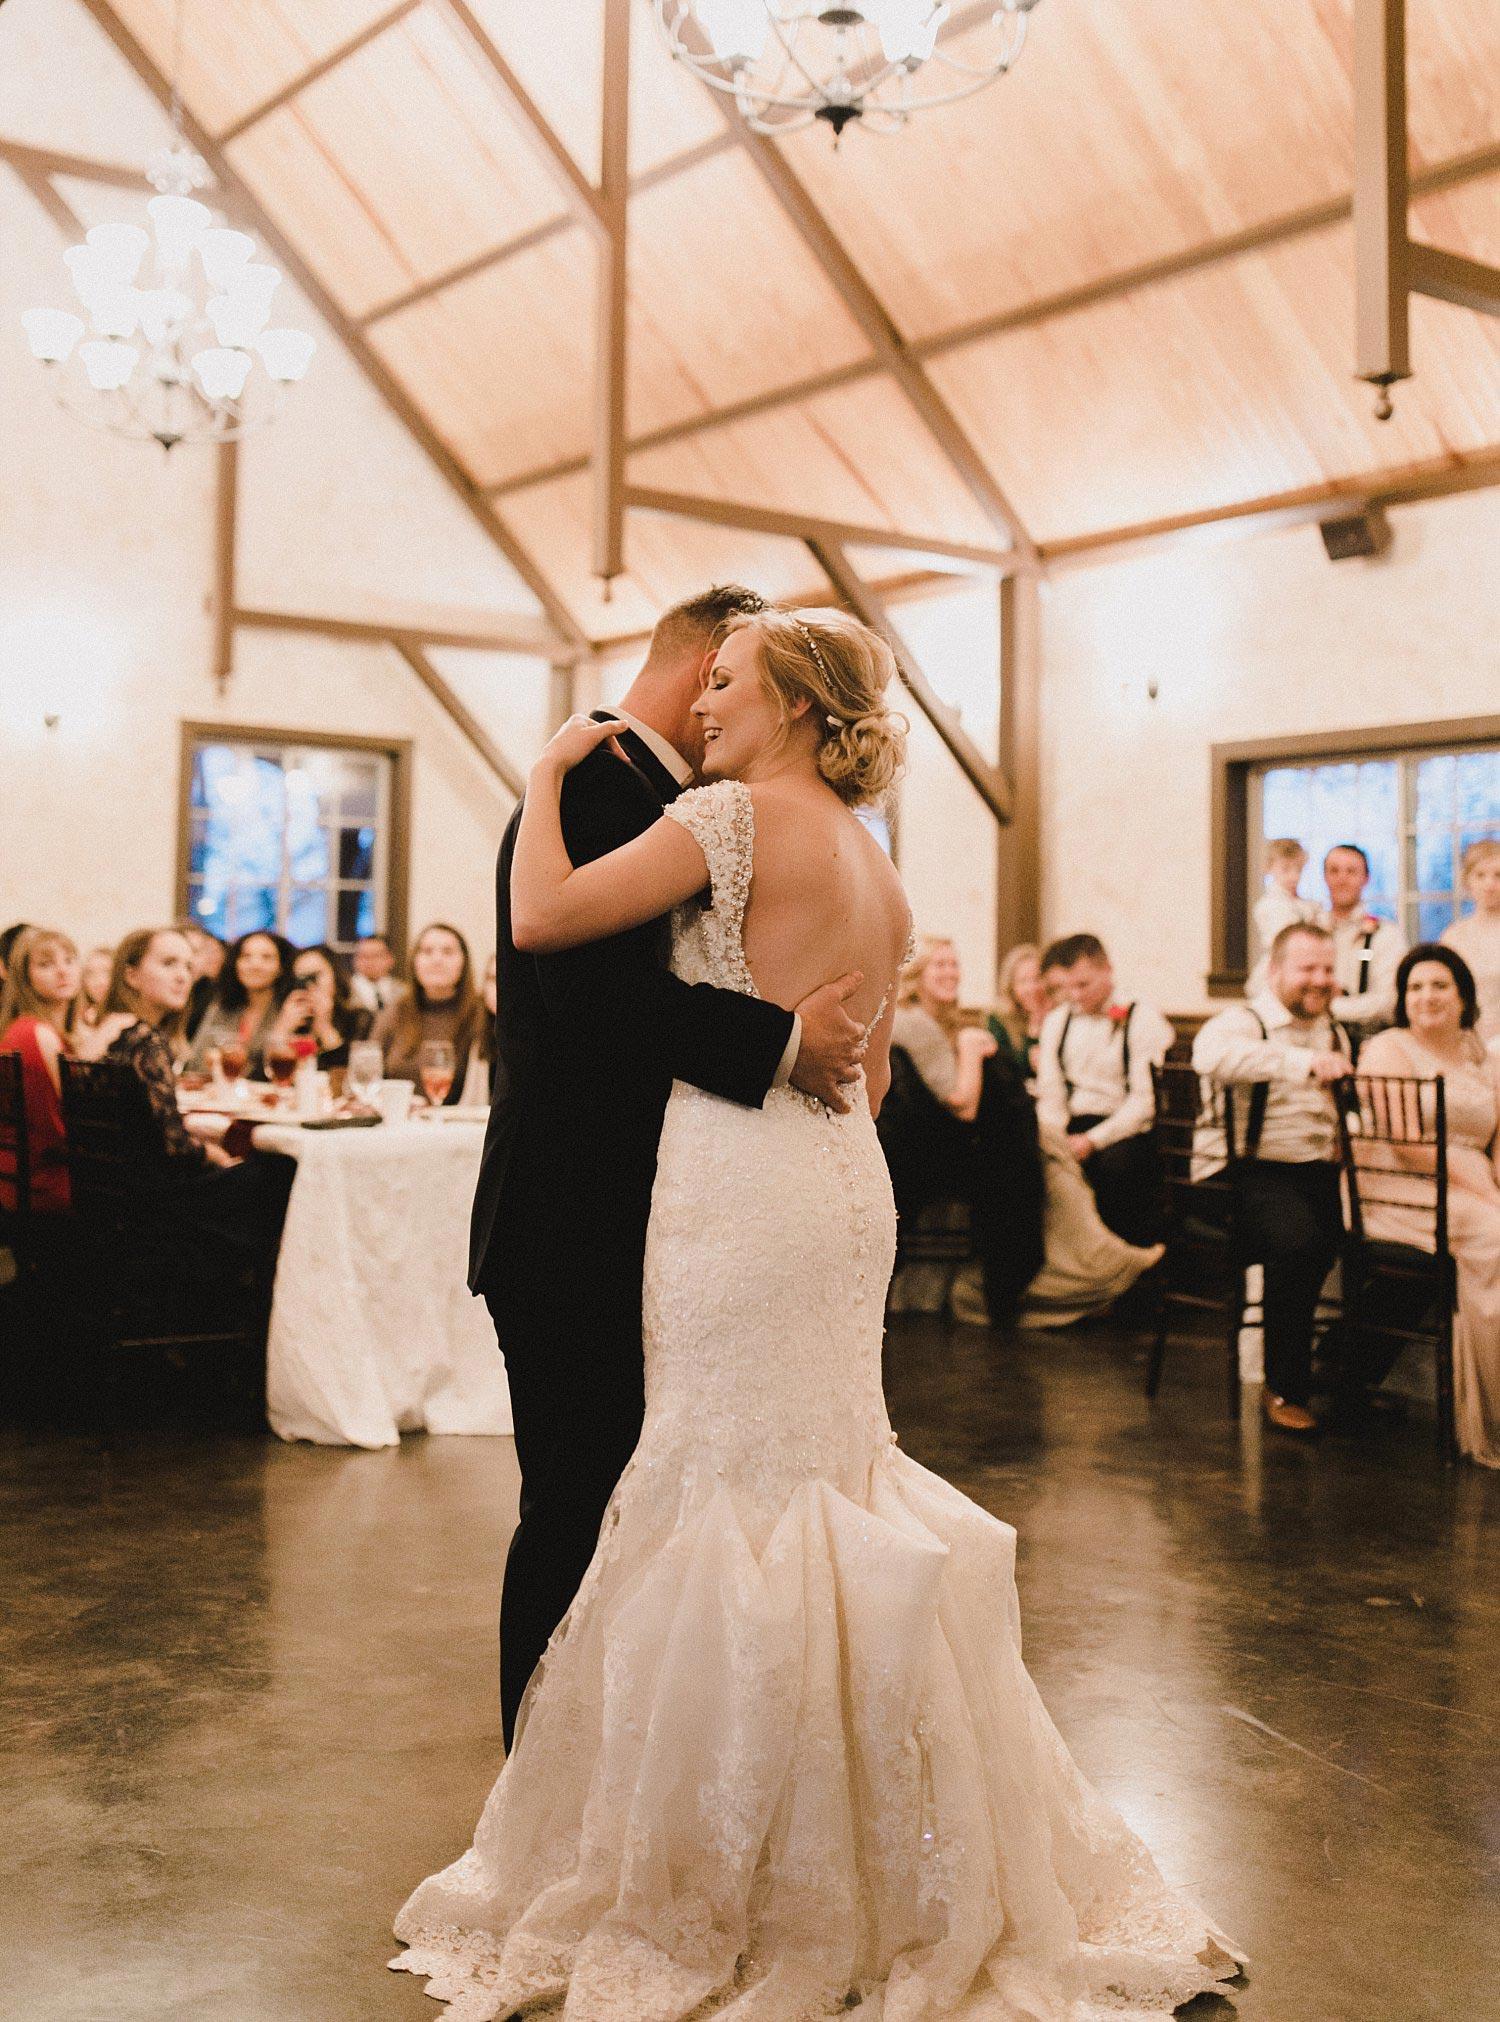 Hollow Hill Farm Event Center Wedding great room first dance